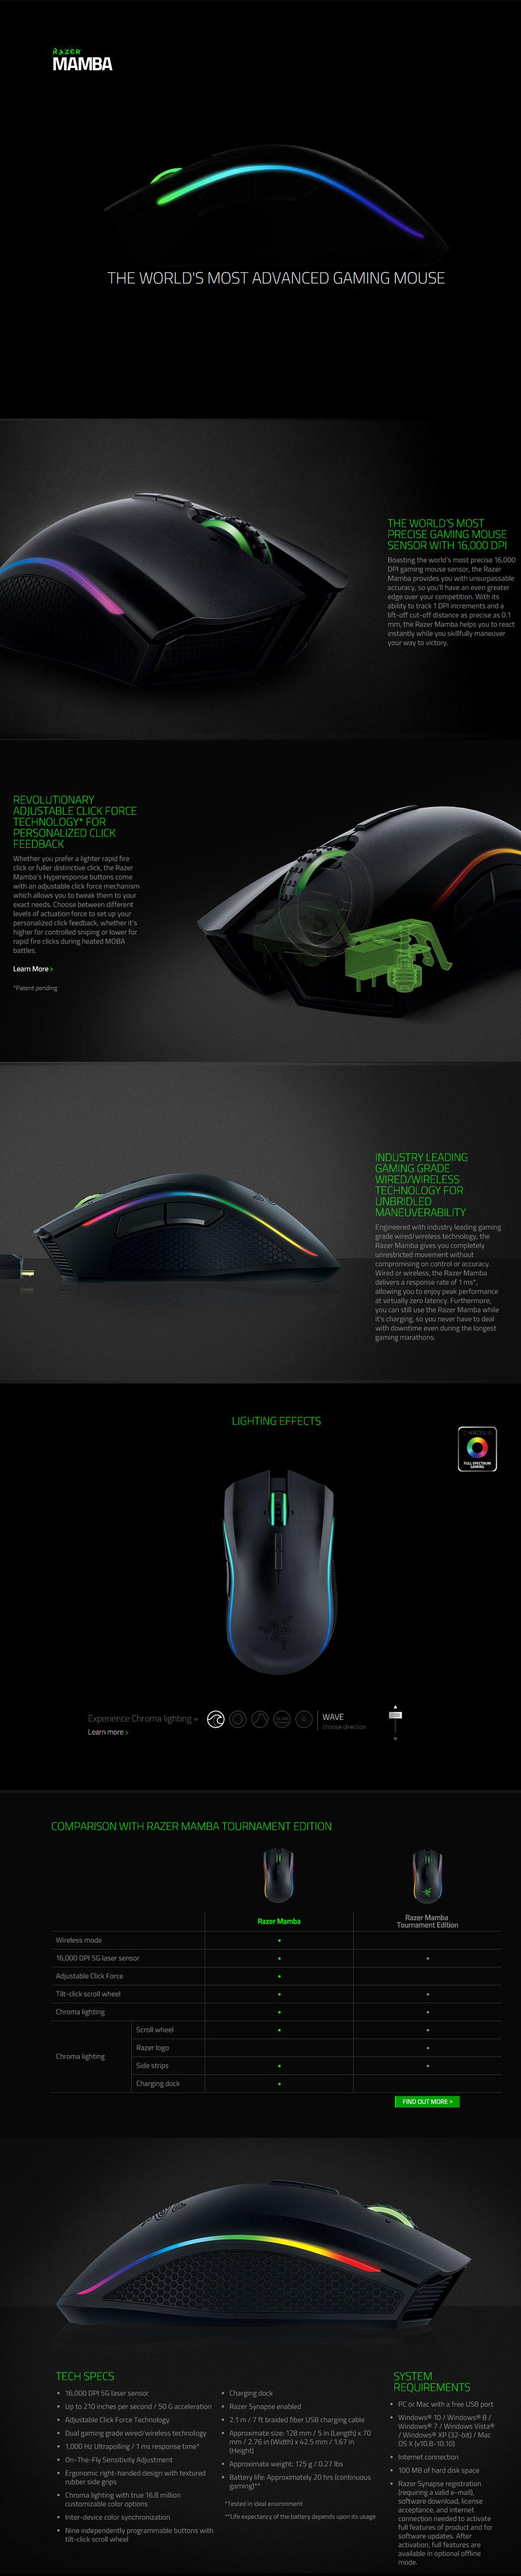 Razer Mamba Wireless Gaming Mouse with Charging Dock RGB